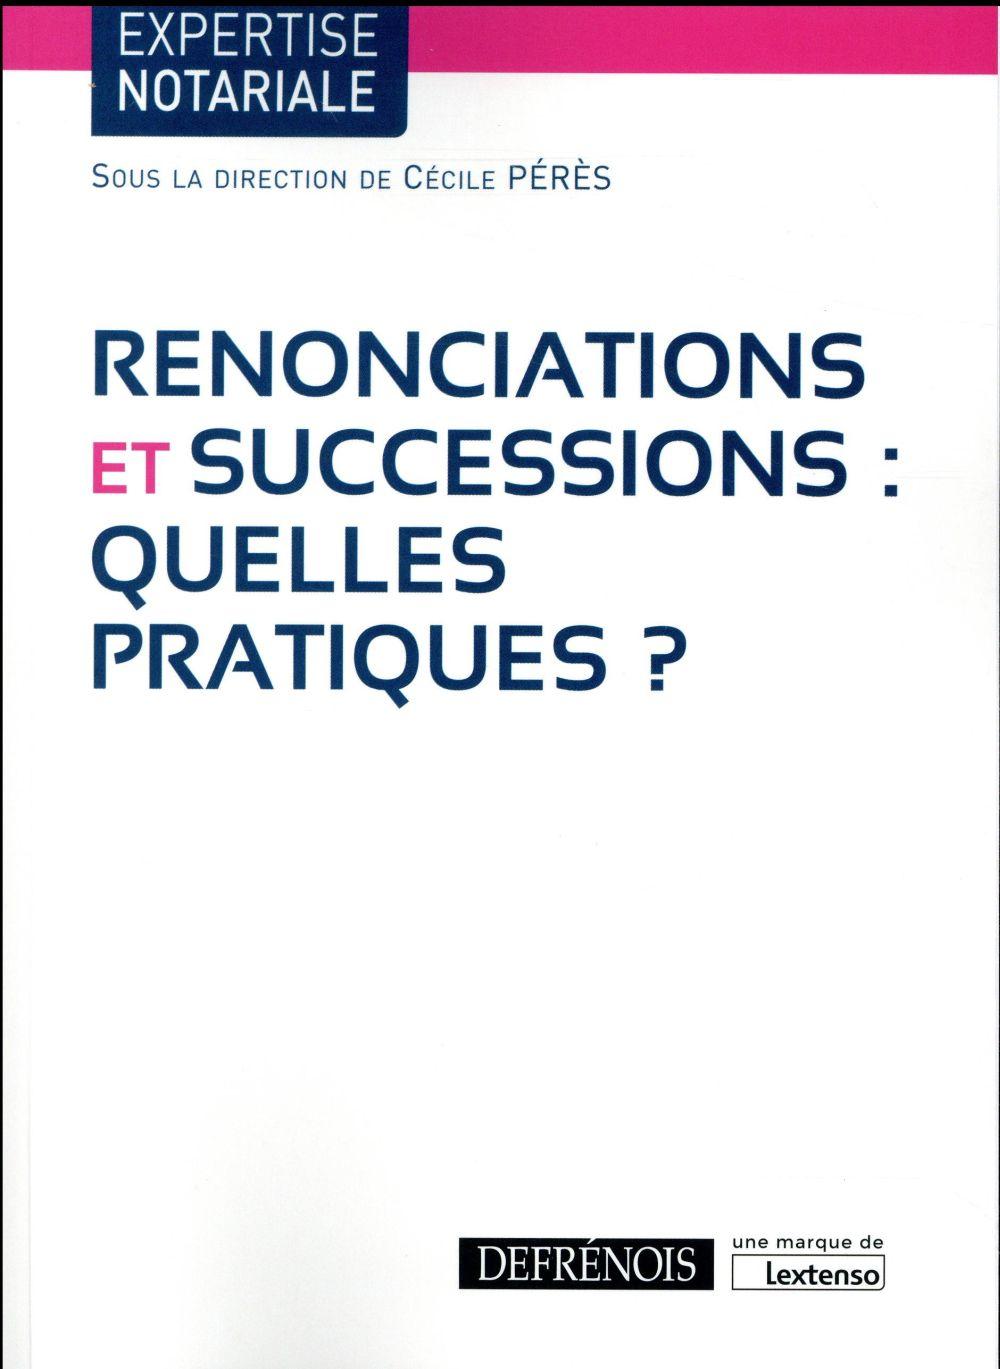 Renonciations et successions : quelles pratiques ?